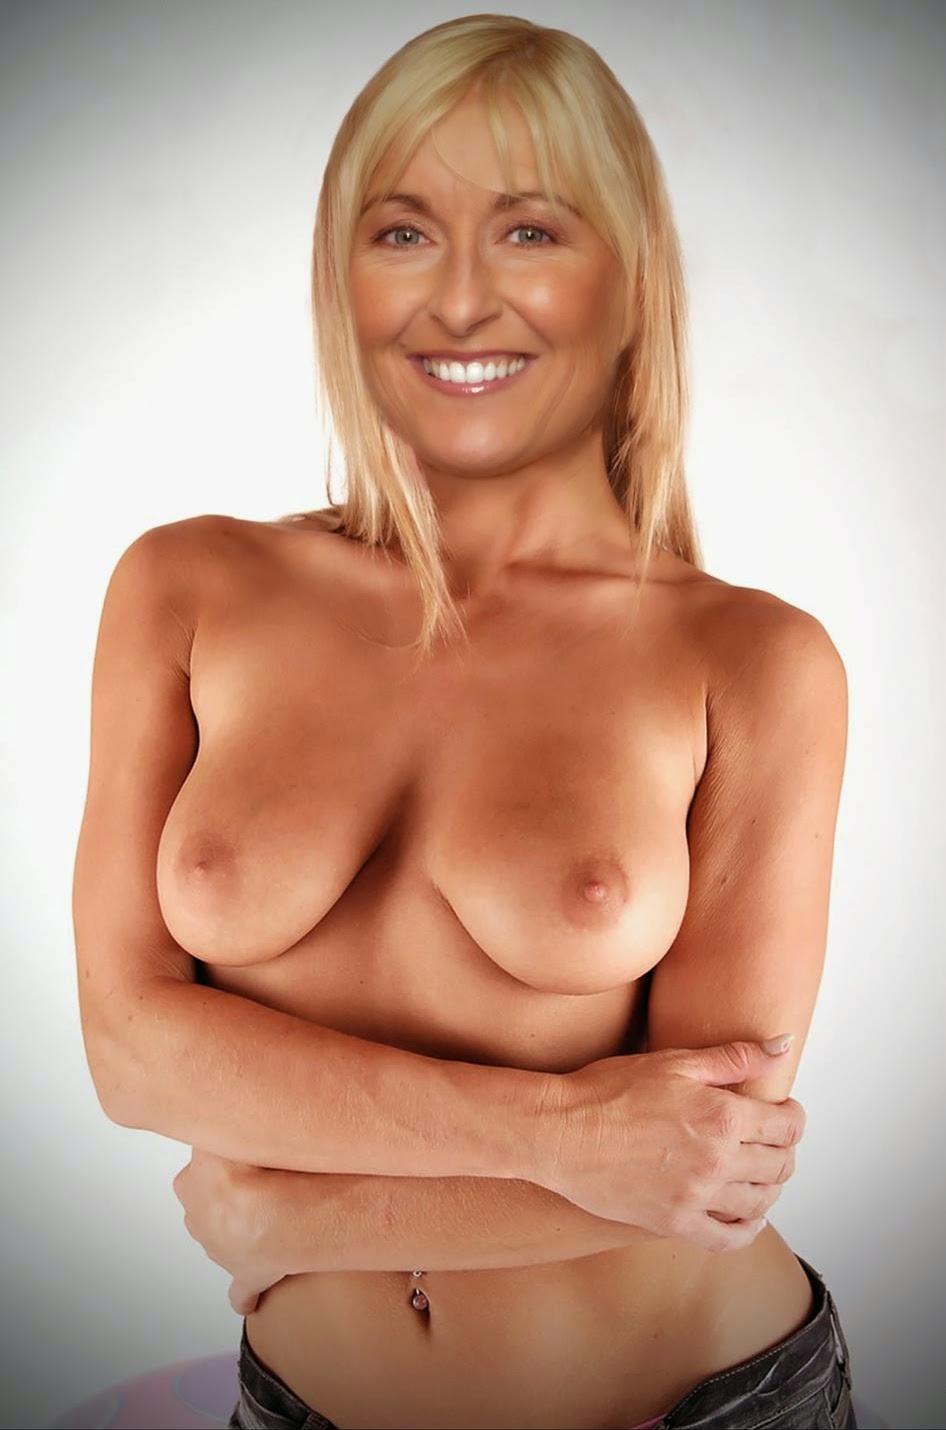 Fiona Vroom Naked naked celebs pics fiona phillips porn fake gallery-37296